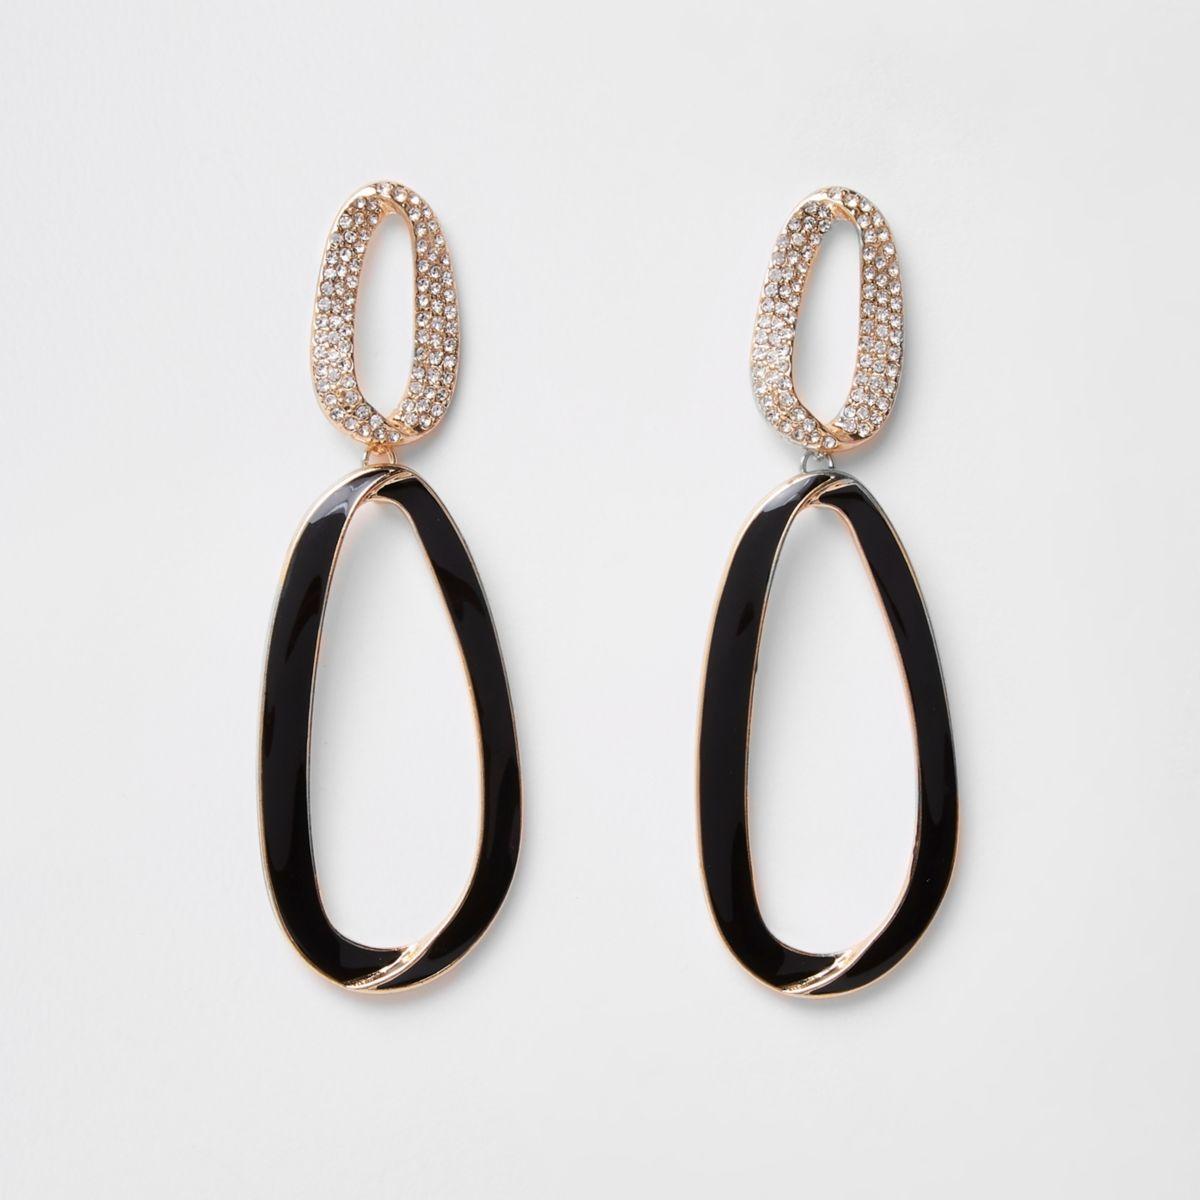 Gold tone black enamel hoop drop earrings